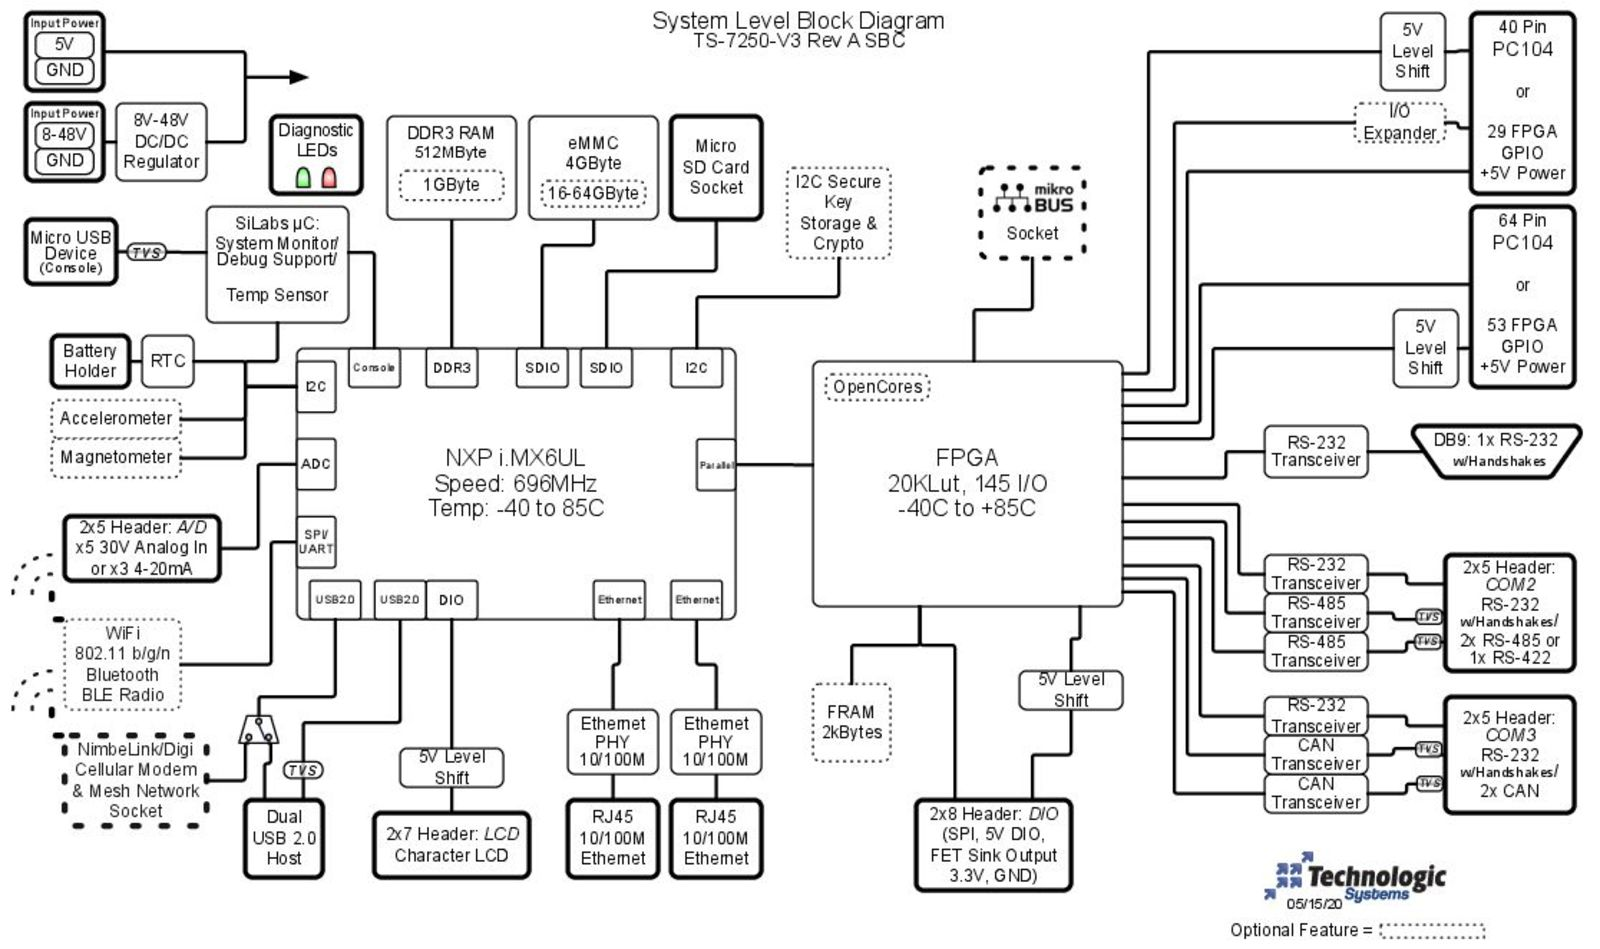 TS-7250-V3 Block Diagram Image